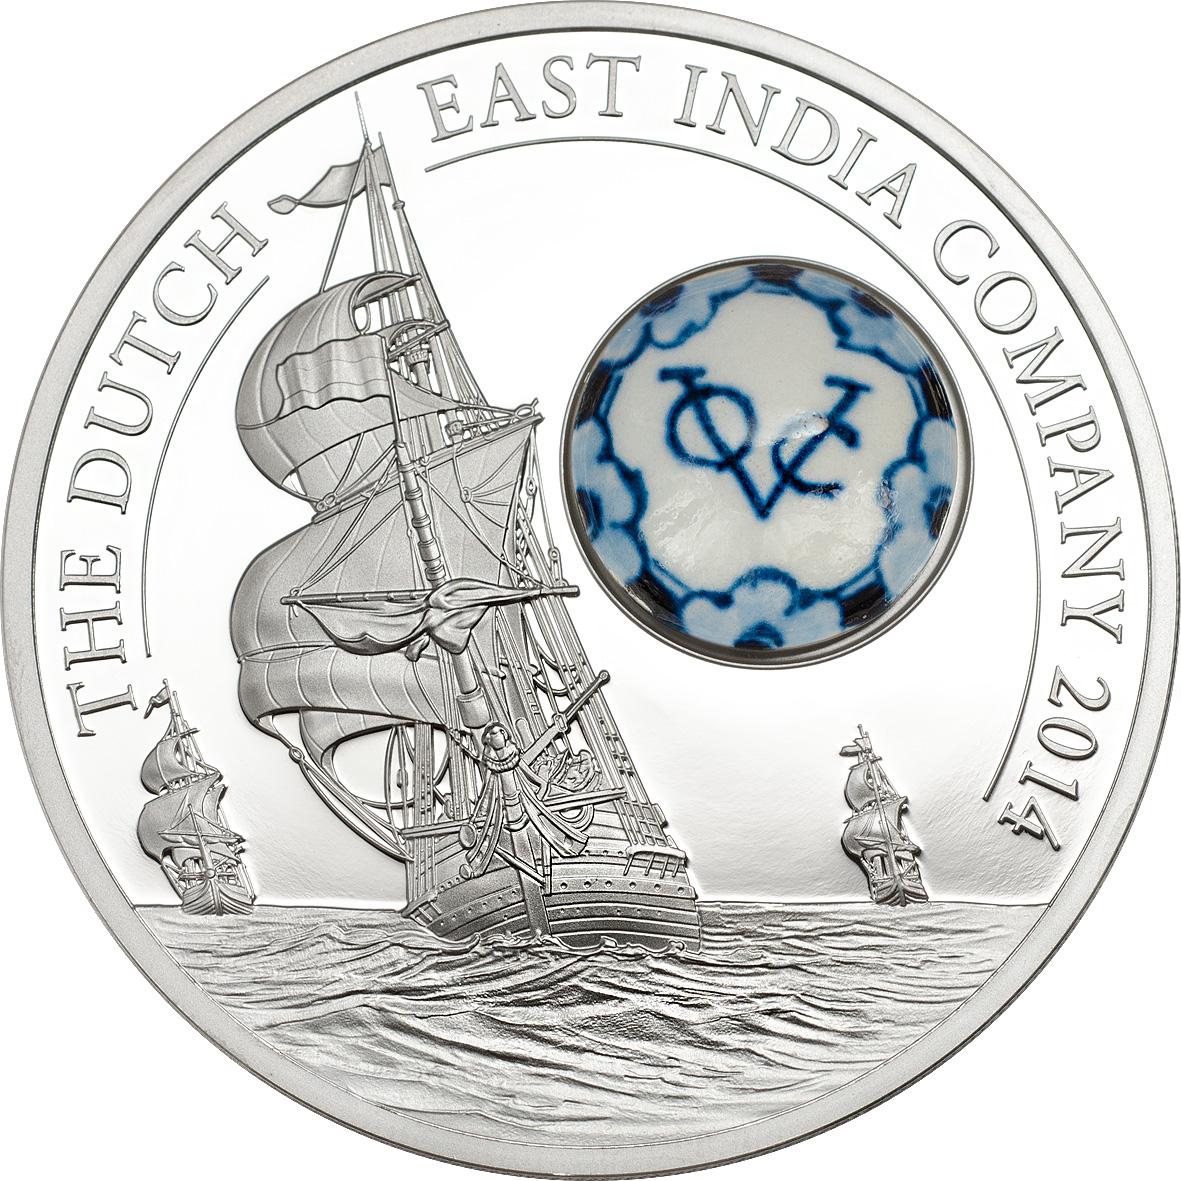 Royal Delft Dutch East India Co. Silver Coin